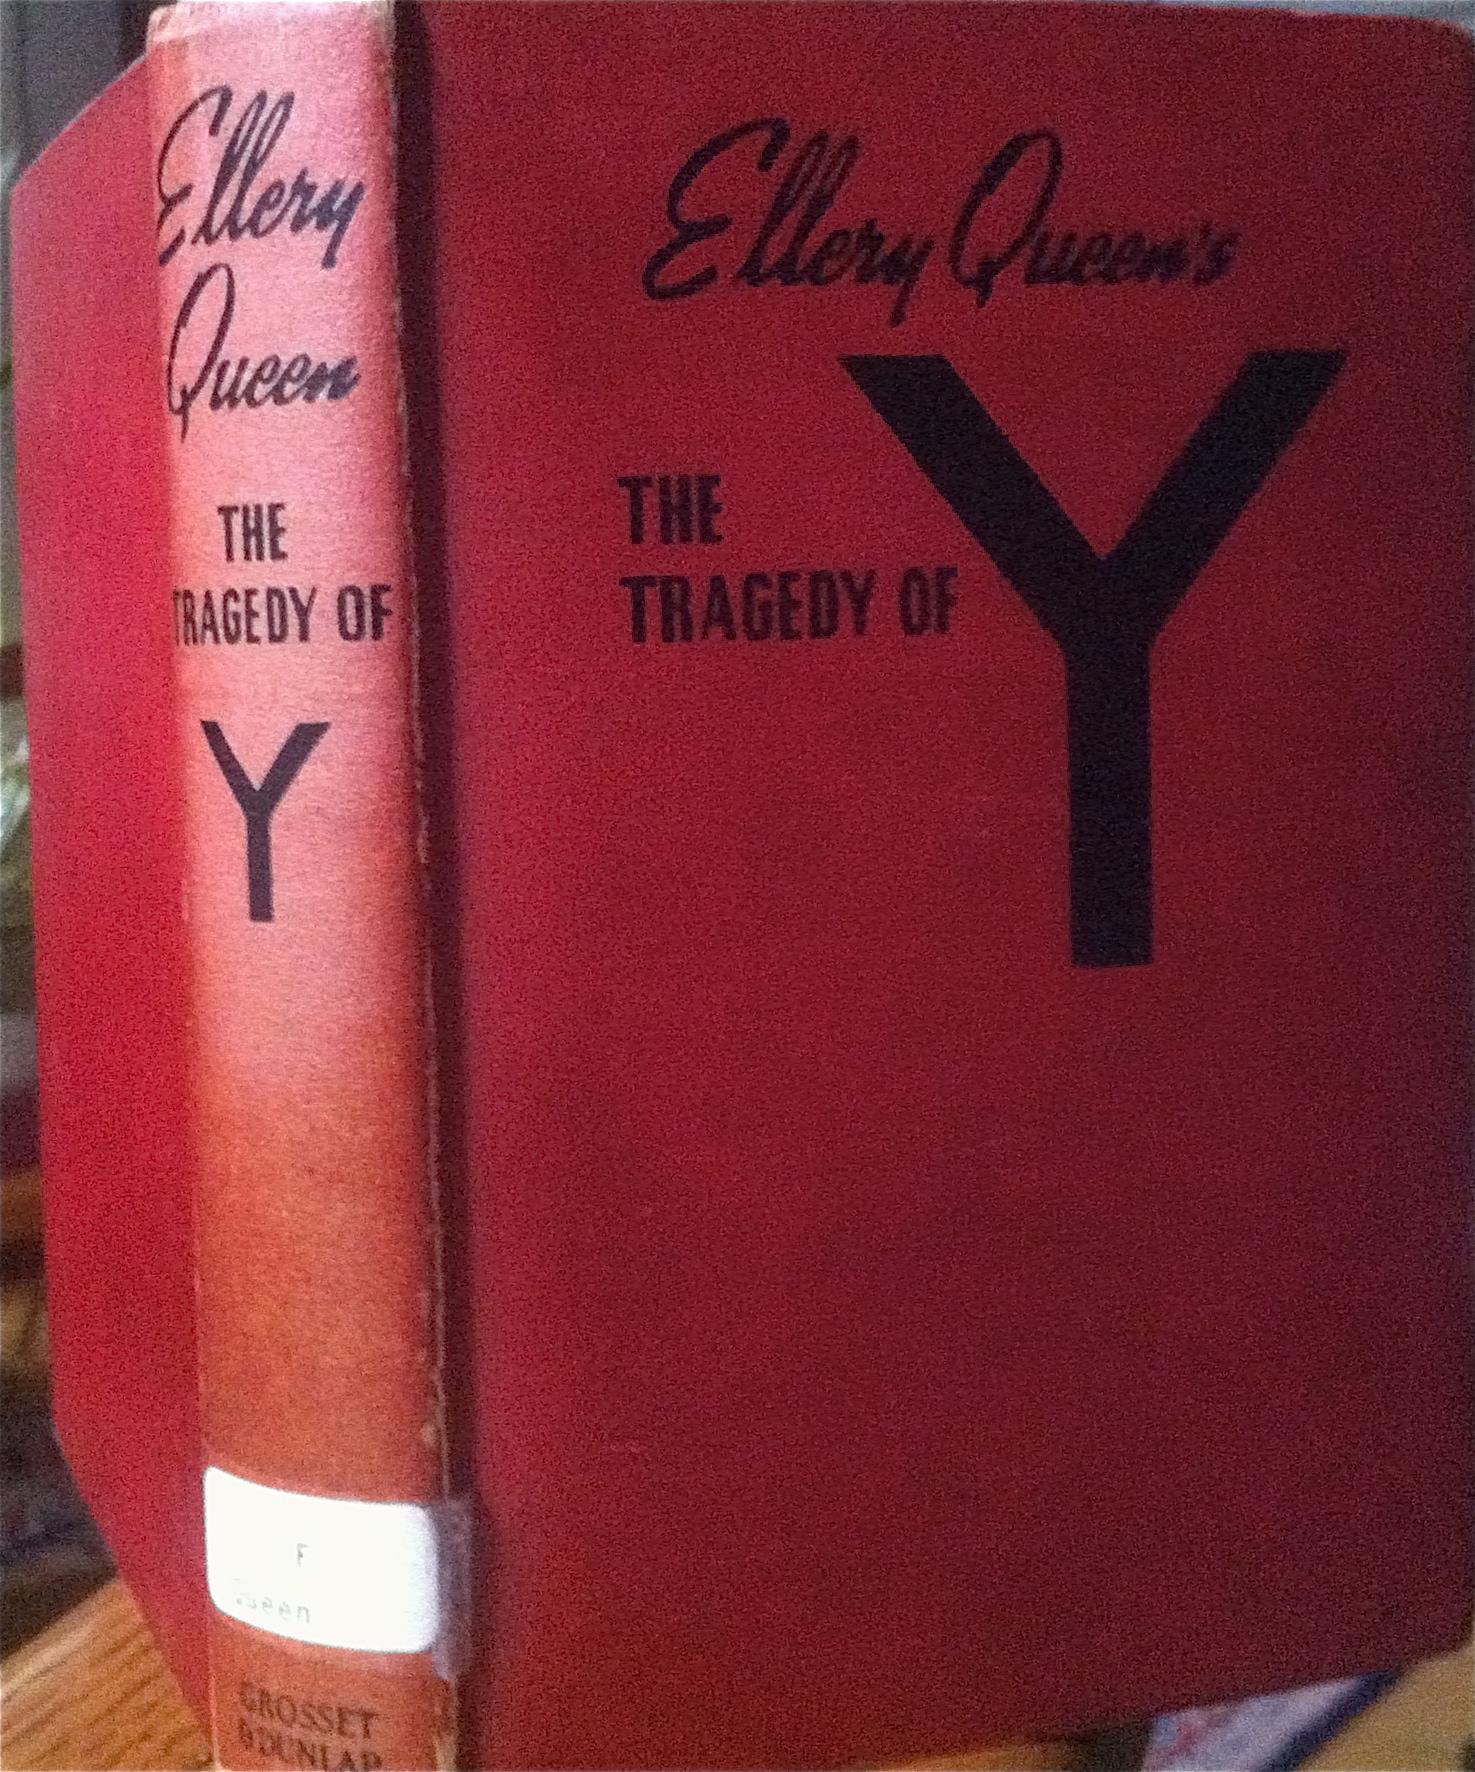 https://readingelleryqueen.files.wordpress.com/2013/07/tragedy-of-y-cover.jpg